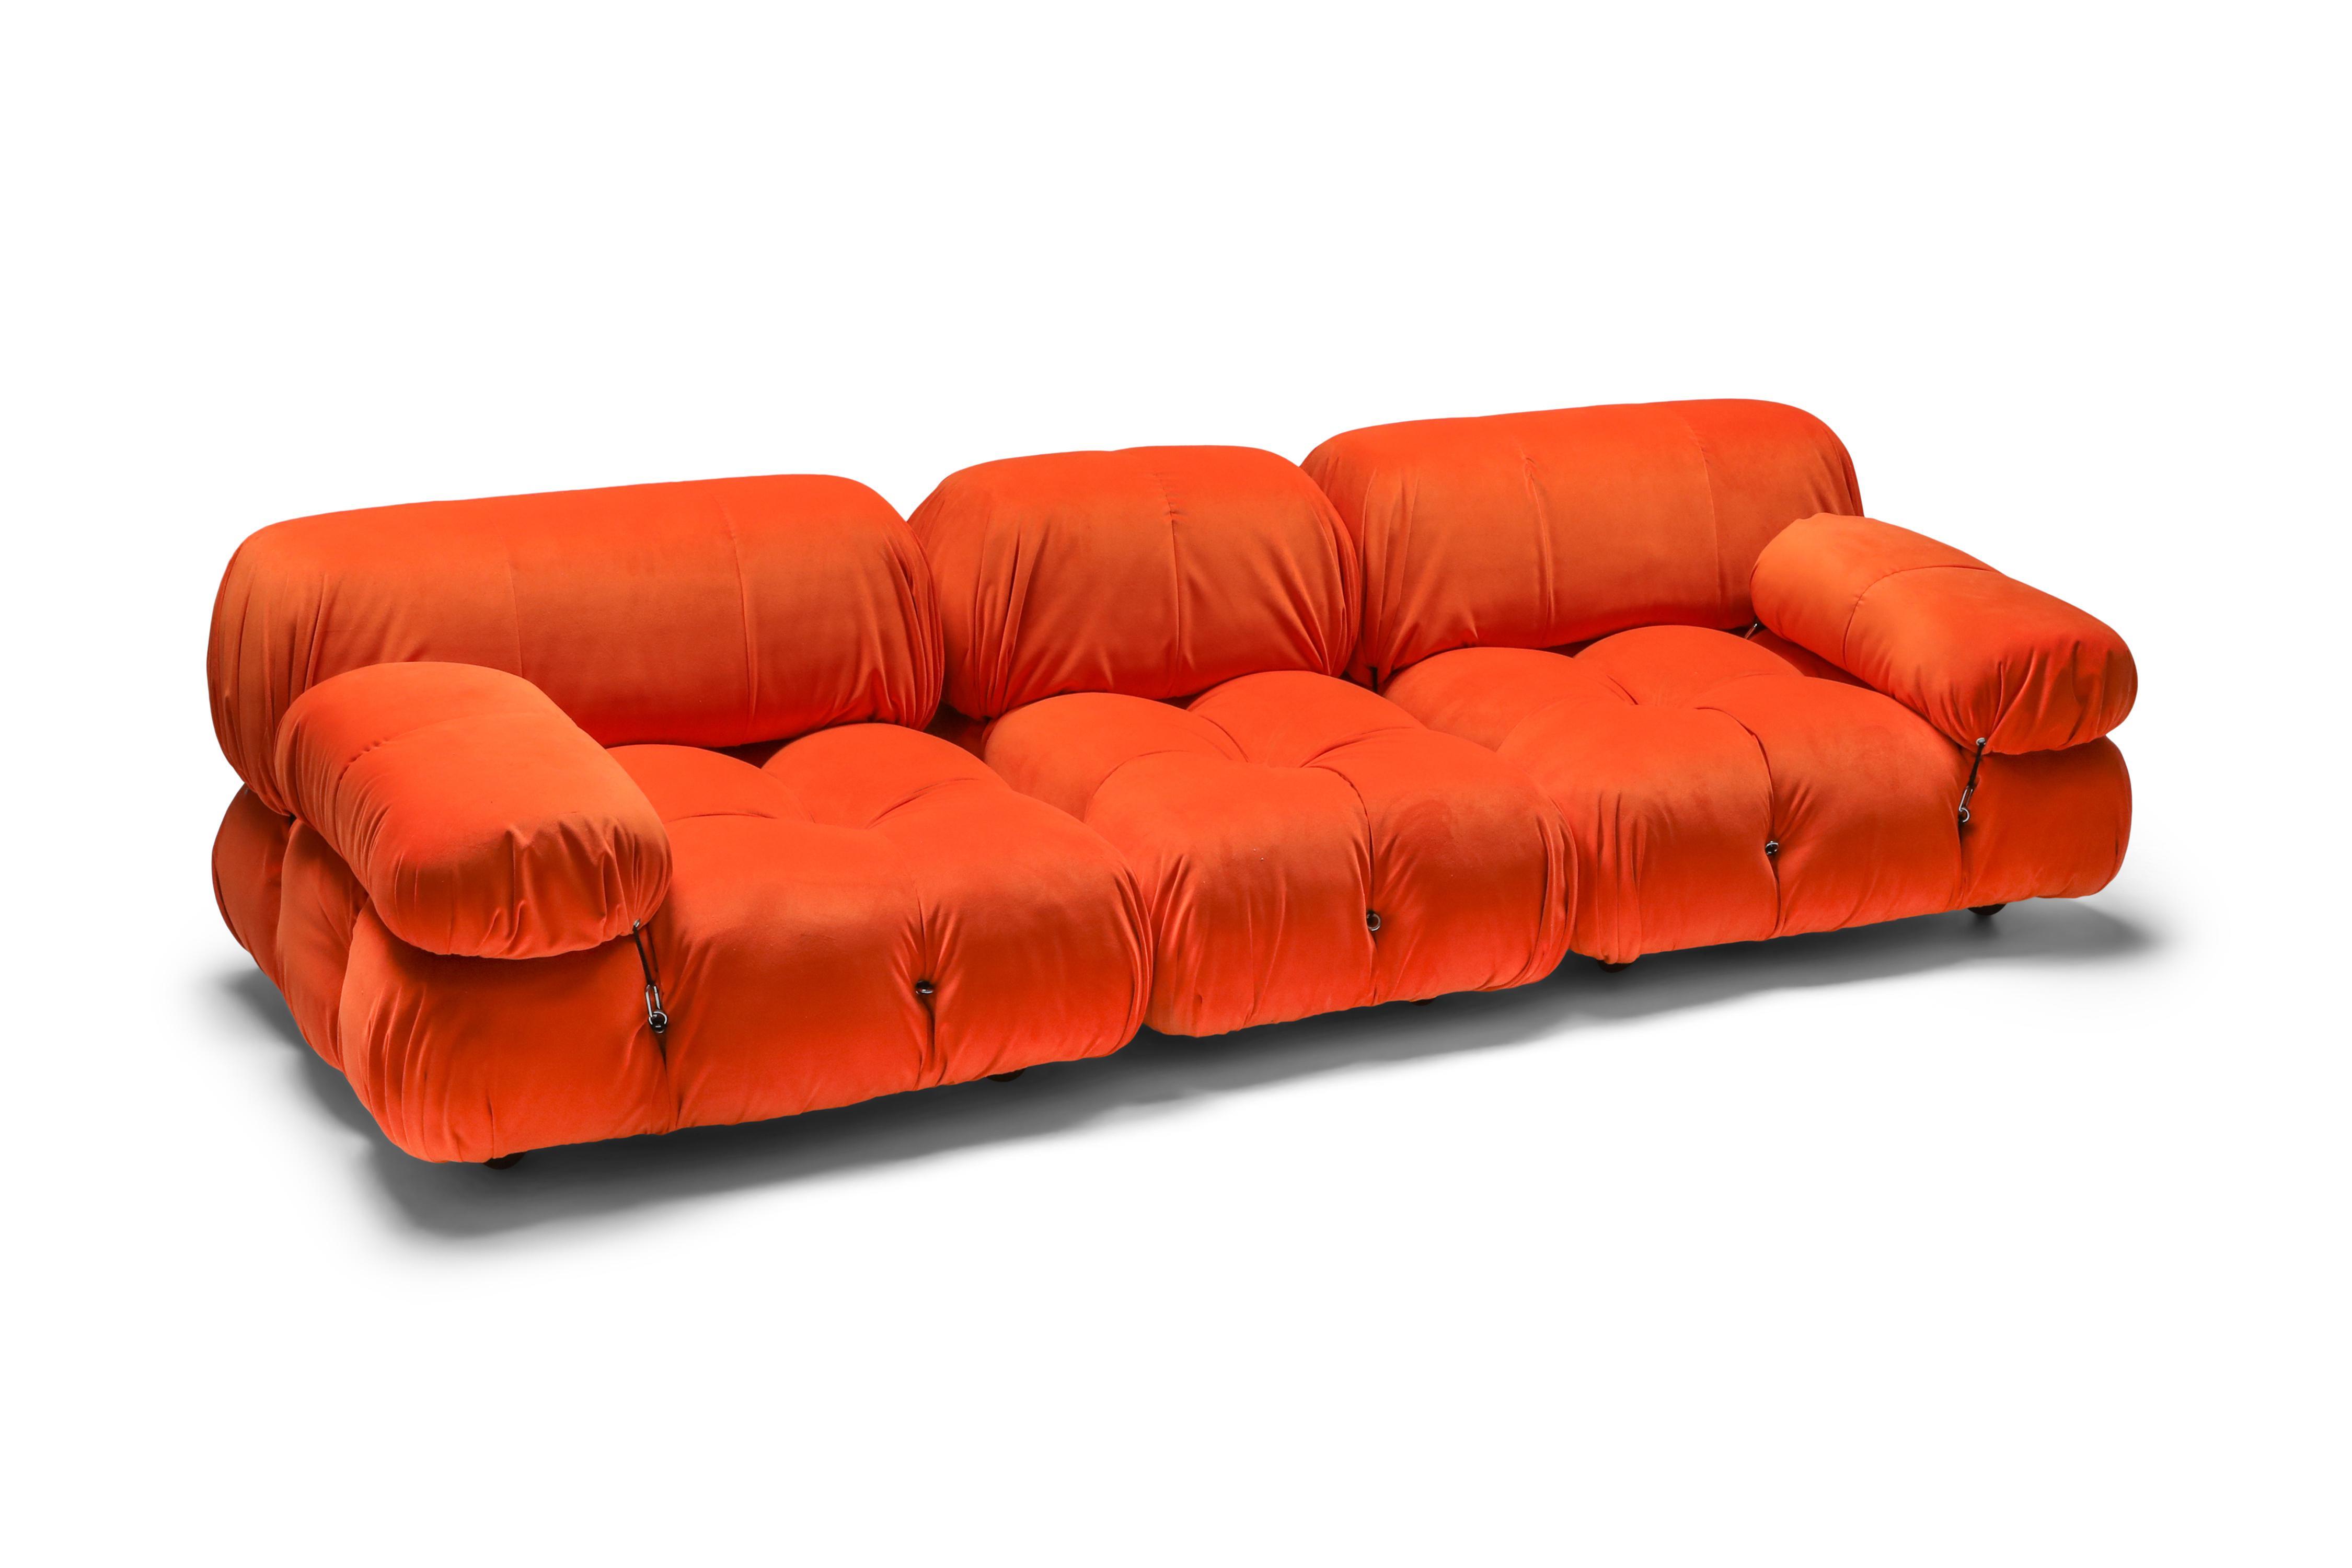 1970s camaleonda sectional sofa in bright orange